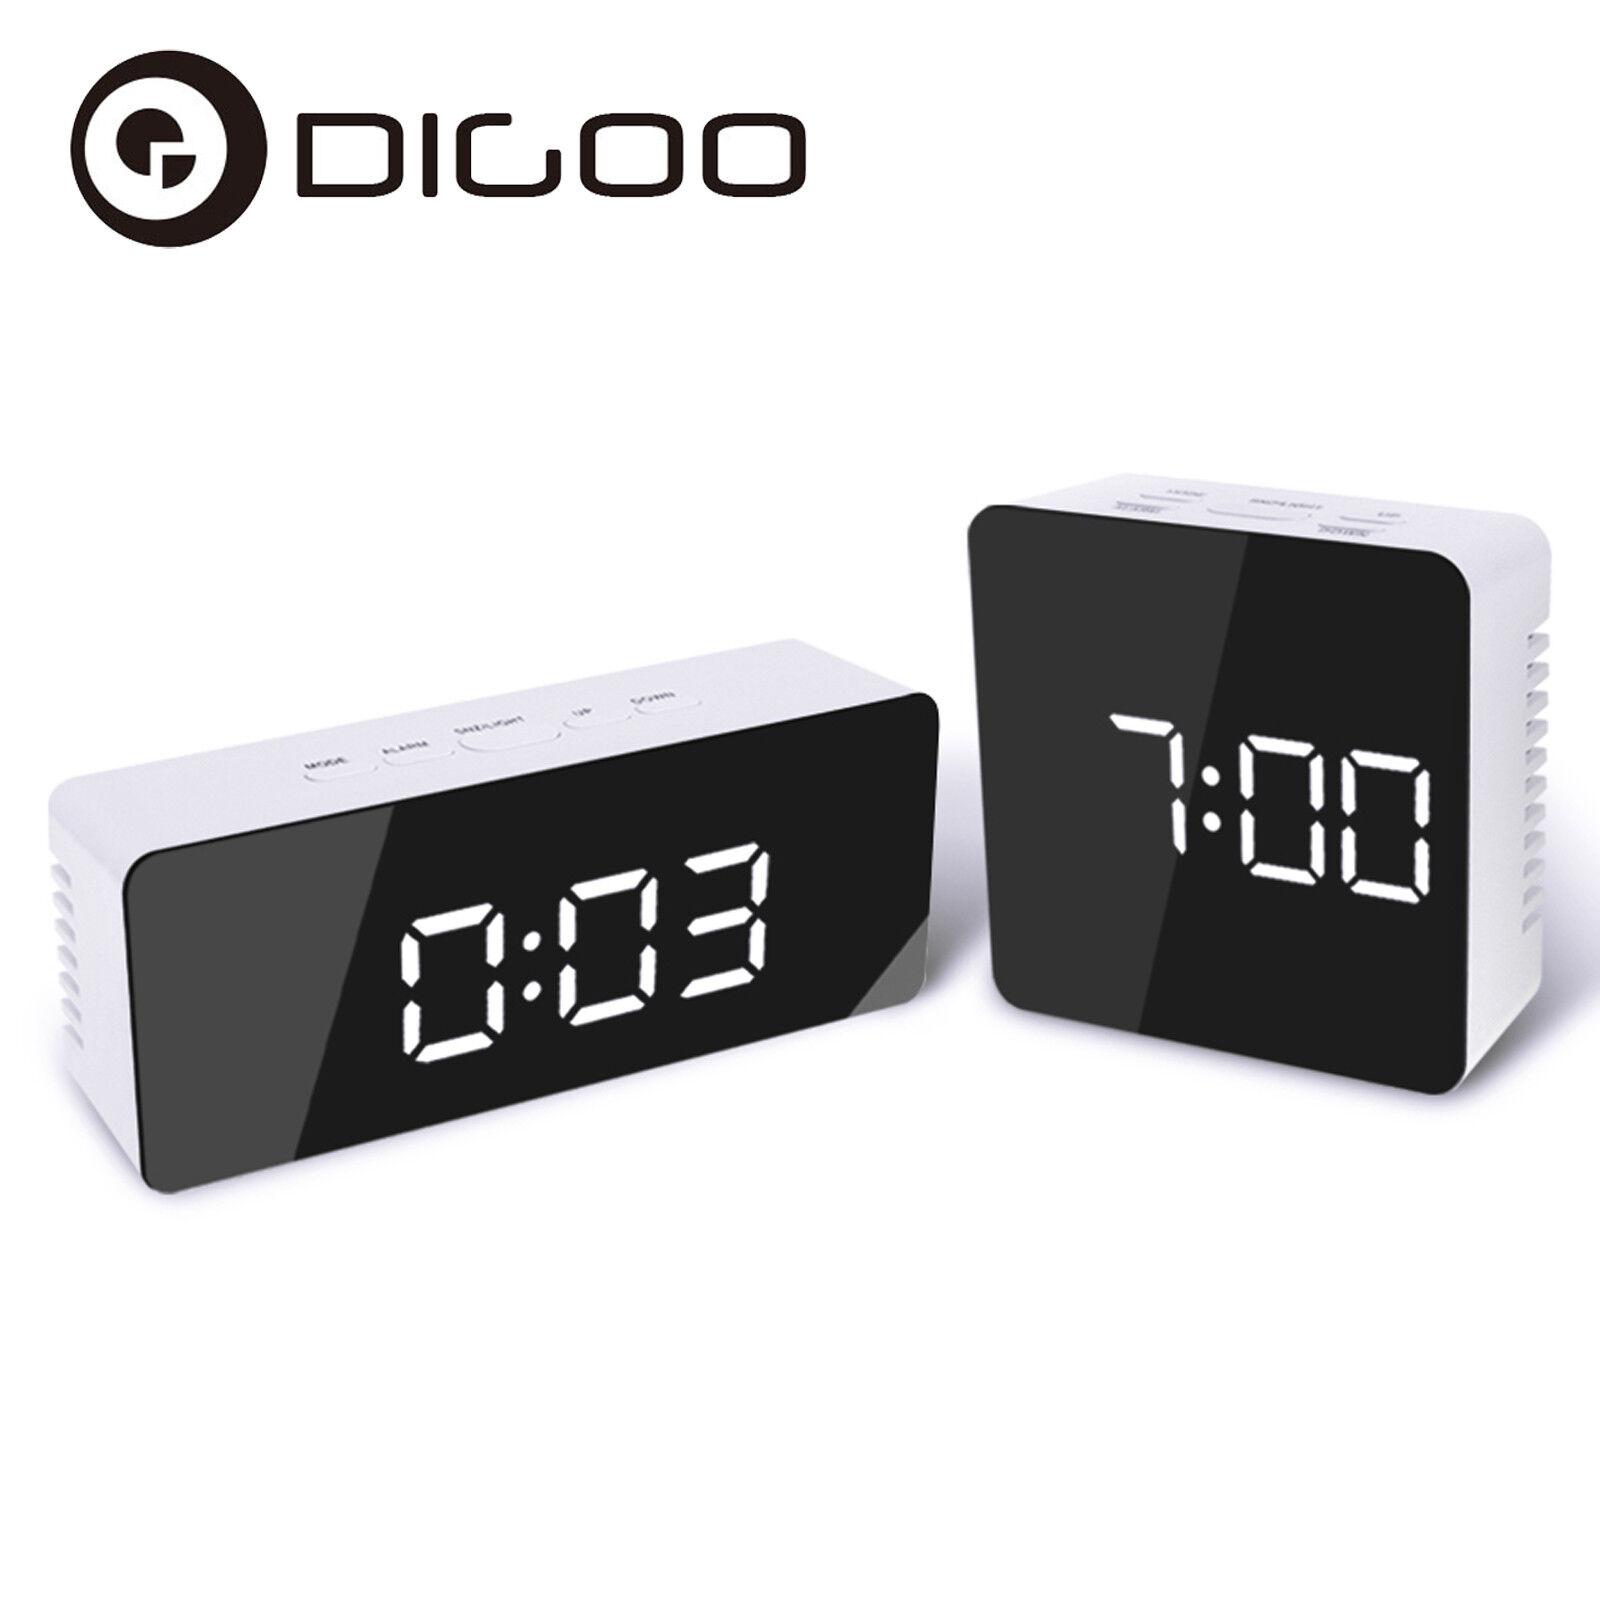 Digoo DG-DM1 Wireless USB Mirror LED Digital Thermometer Temperature Alarm Clock